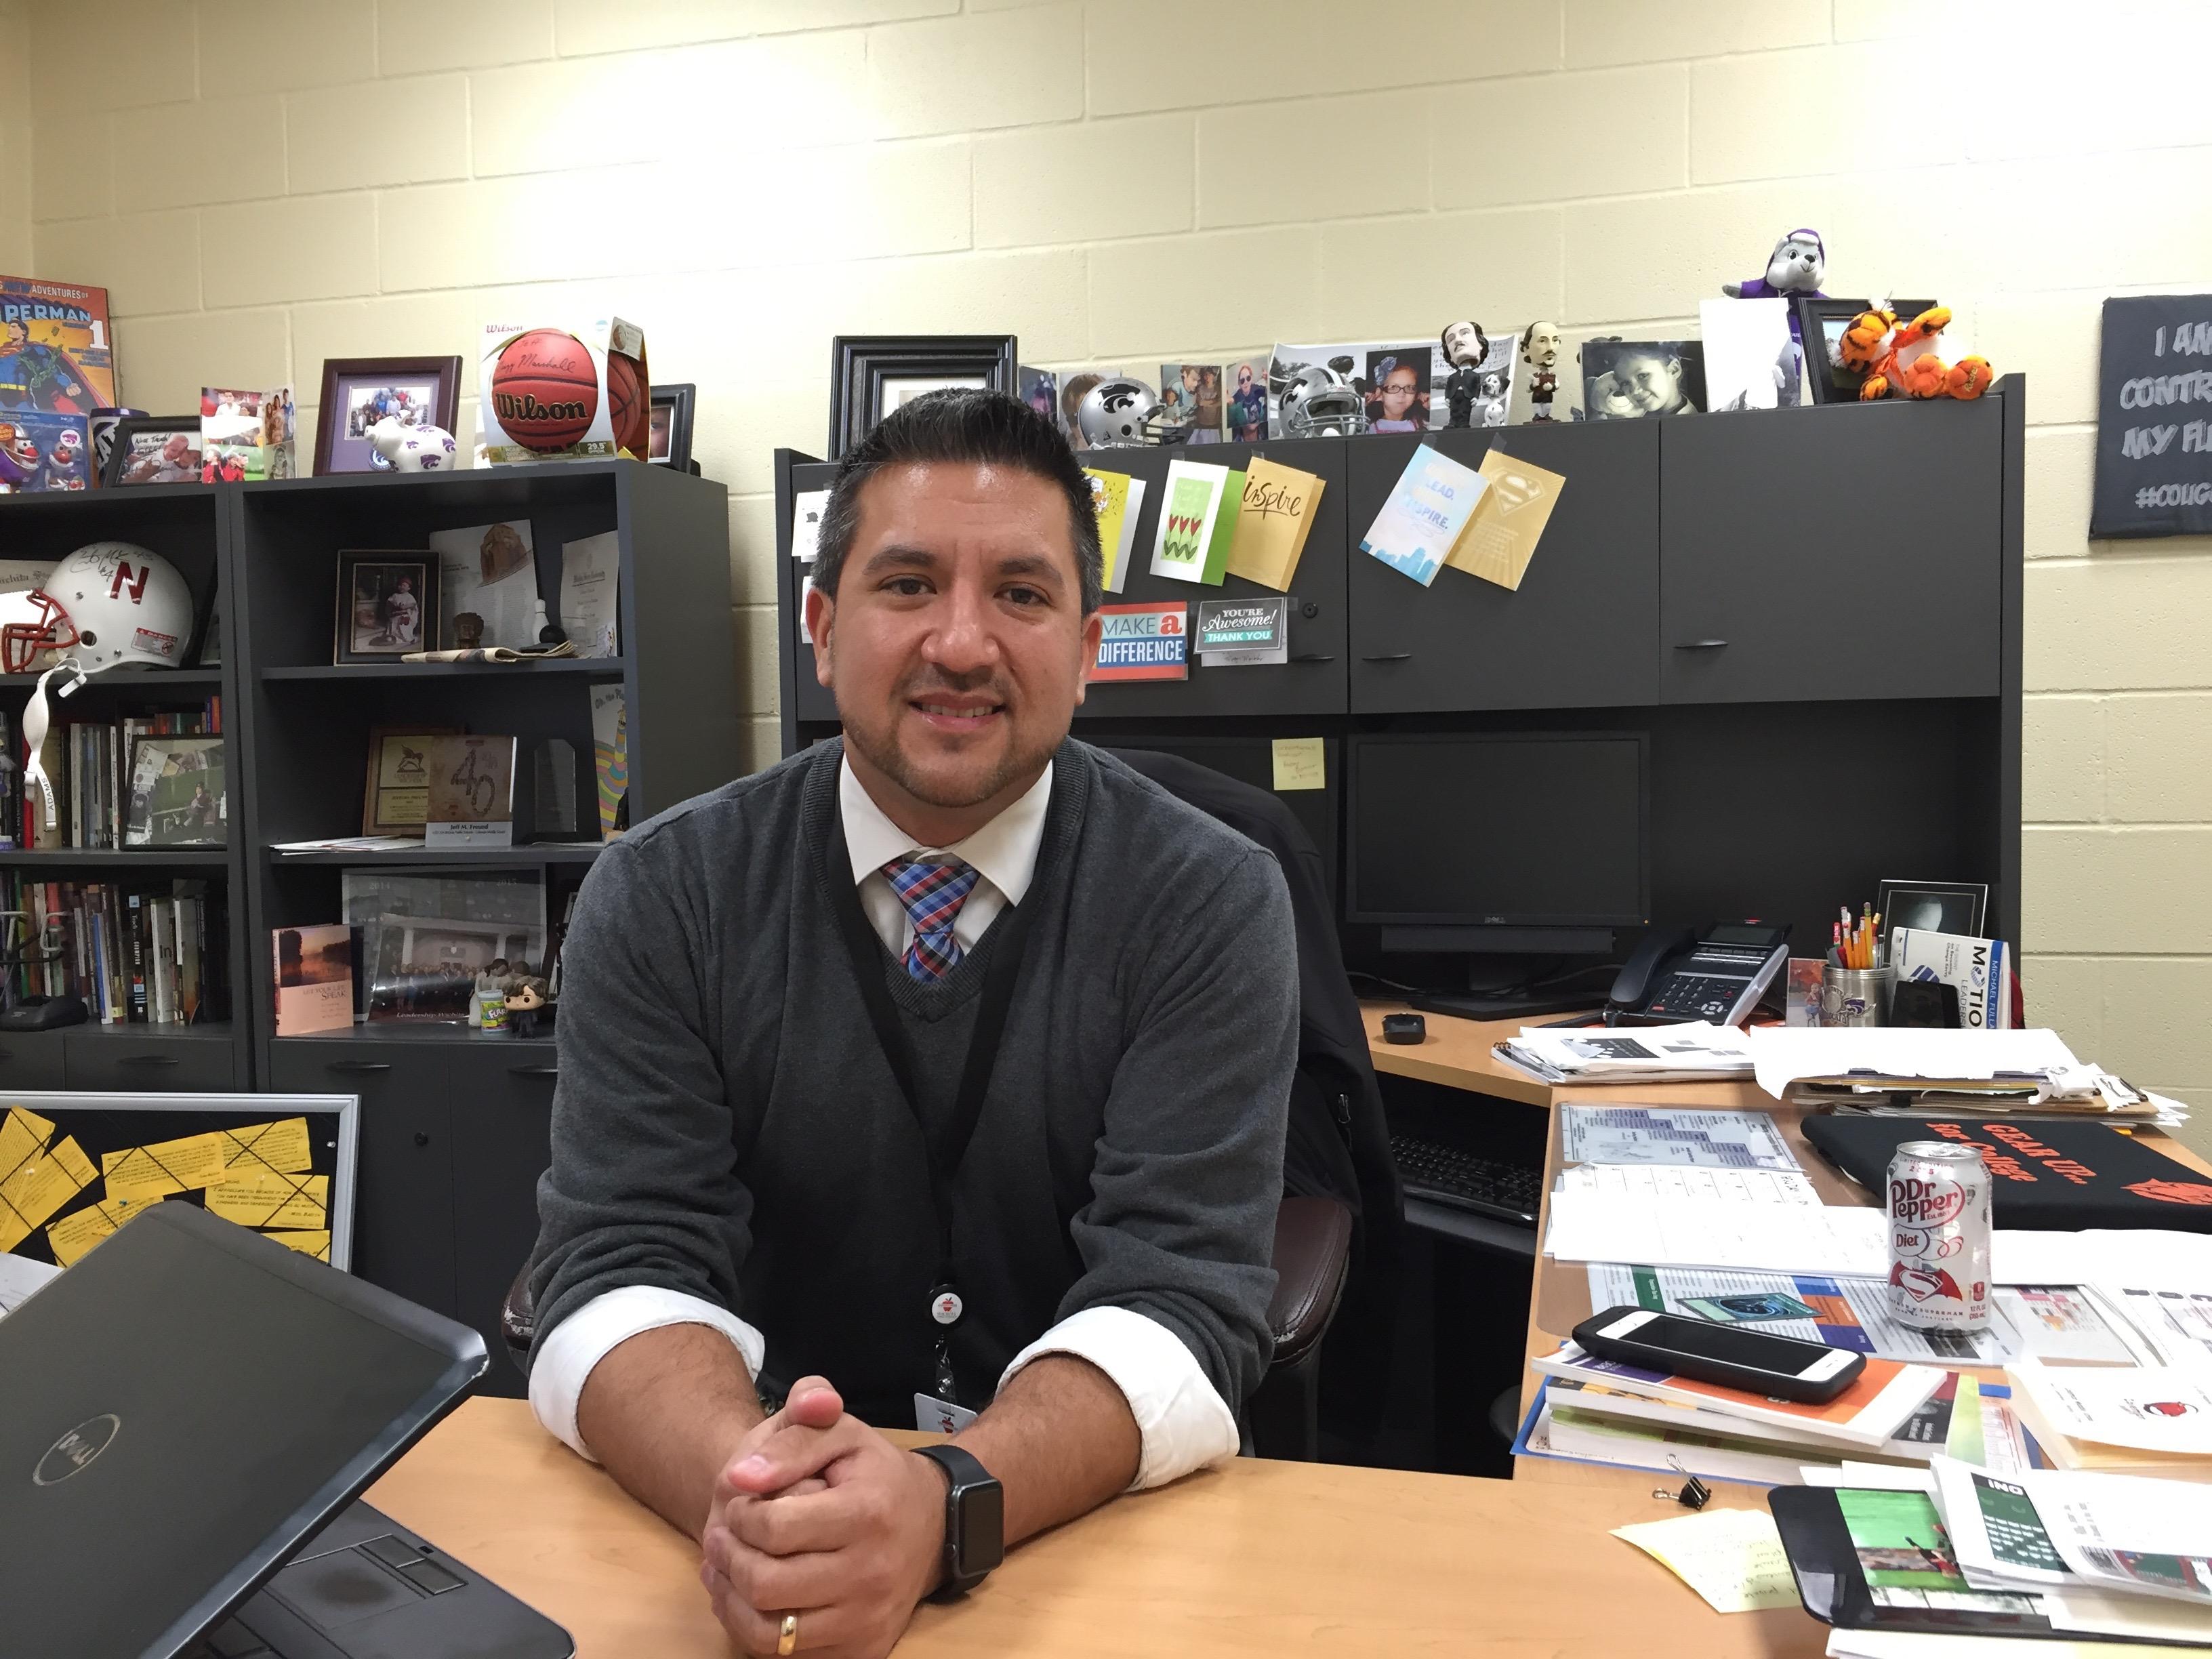 Coleman Middle School Principal Jeff Freund